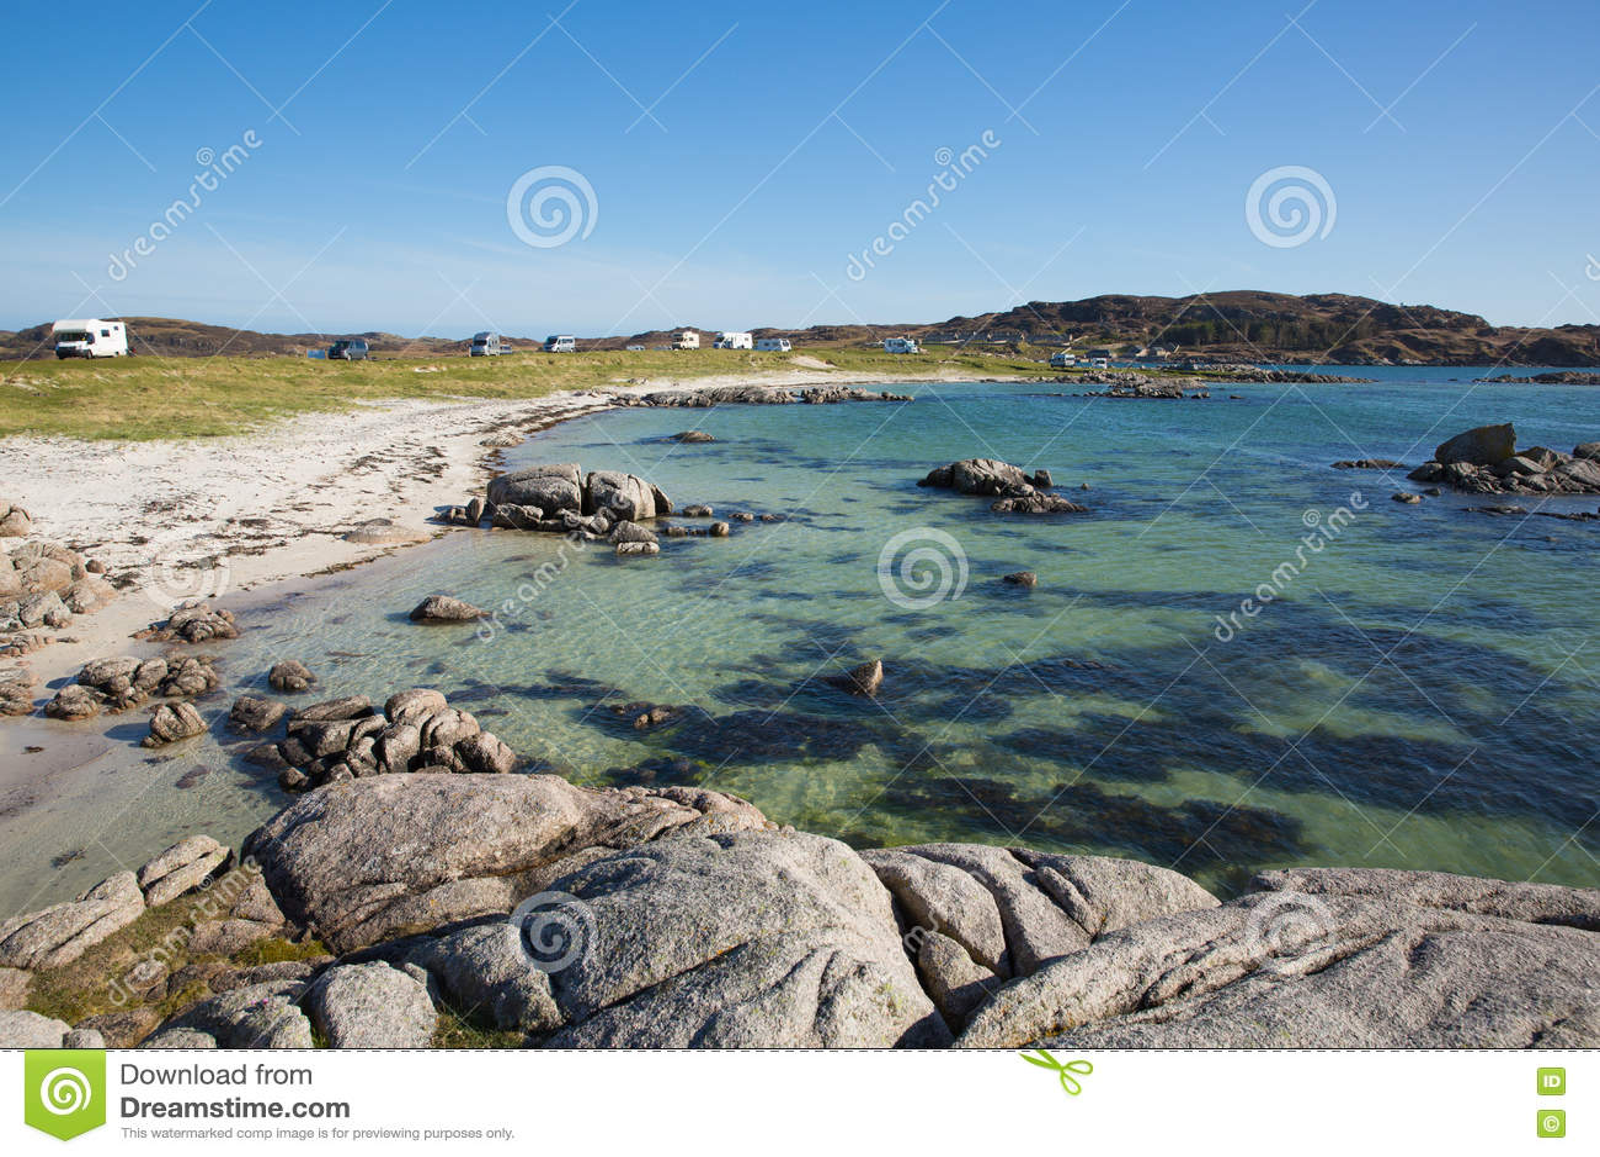 Best Beaches On Iona